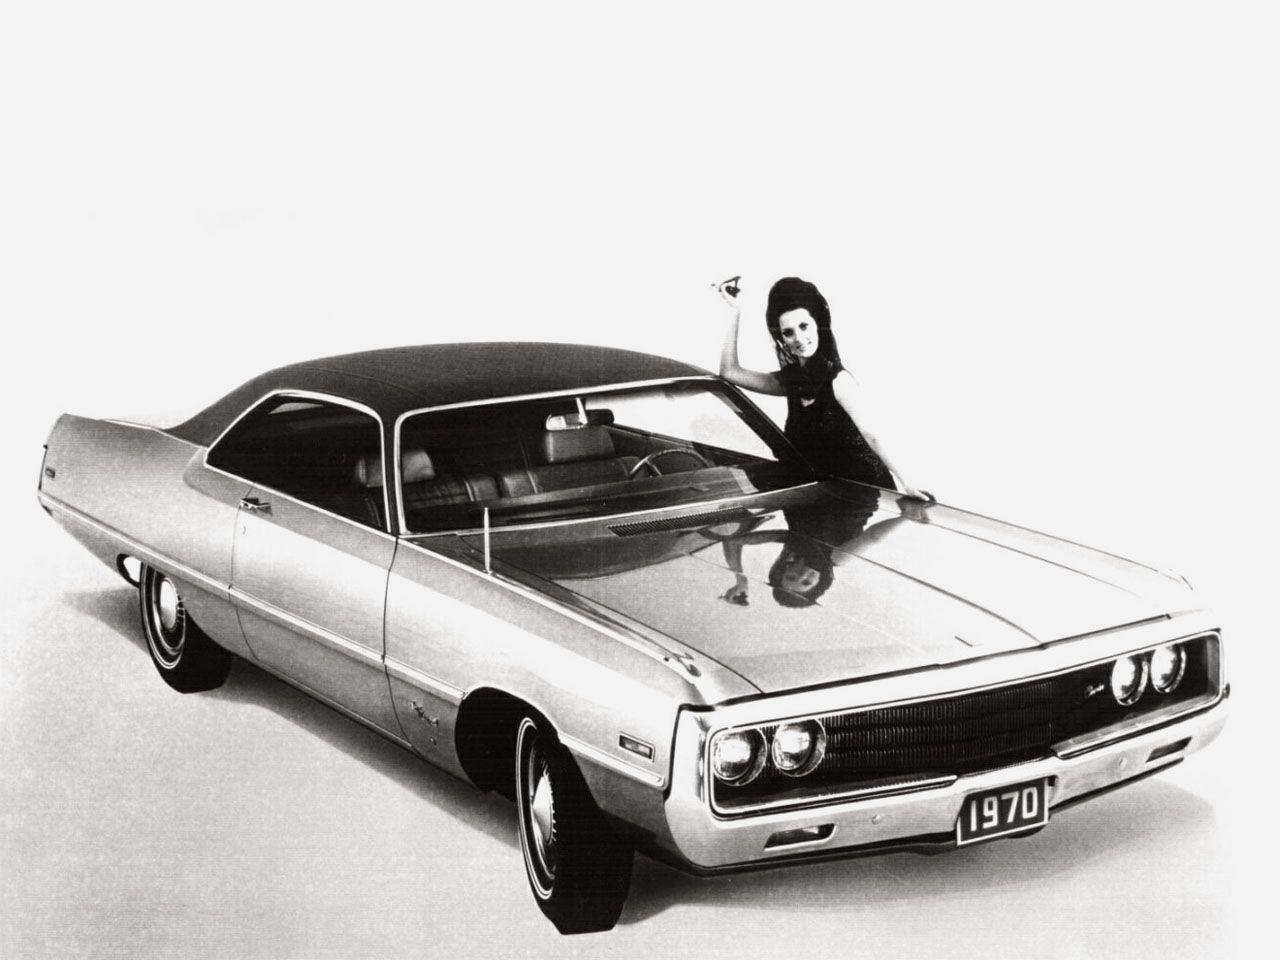 Chrysler newport cordoba 1970 mad 4 wheels